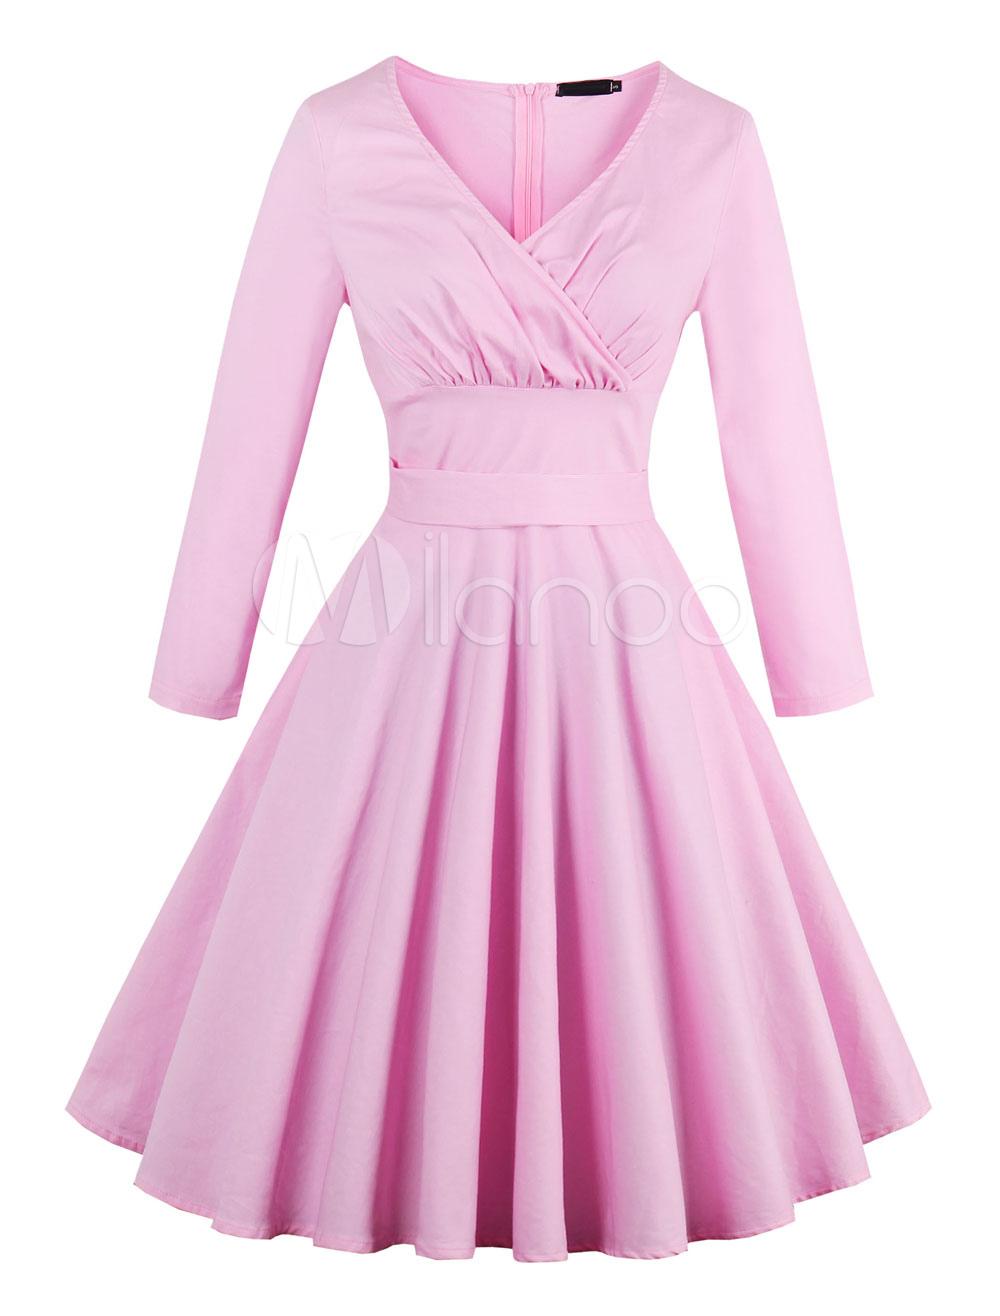 Pink Vintage Dress V Neck 3/4 Length Sleeve Pleated Women's Summer Dresses (Women\\'s Clothing Vintage Dresses) photo